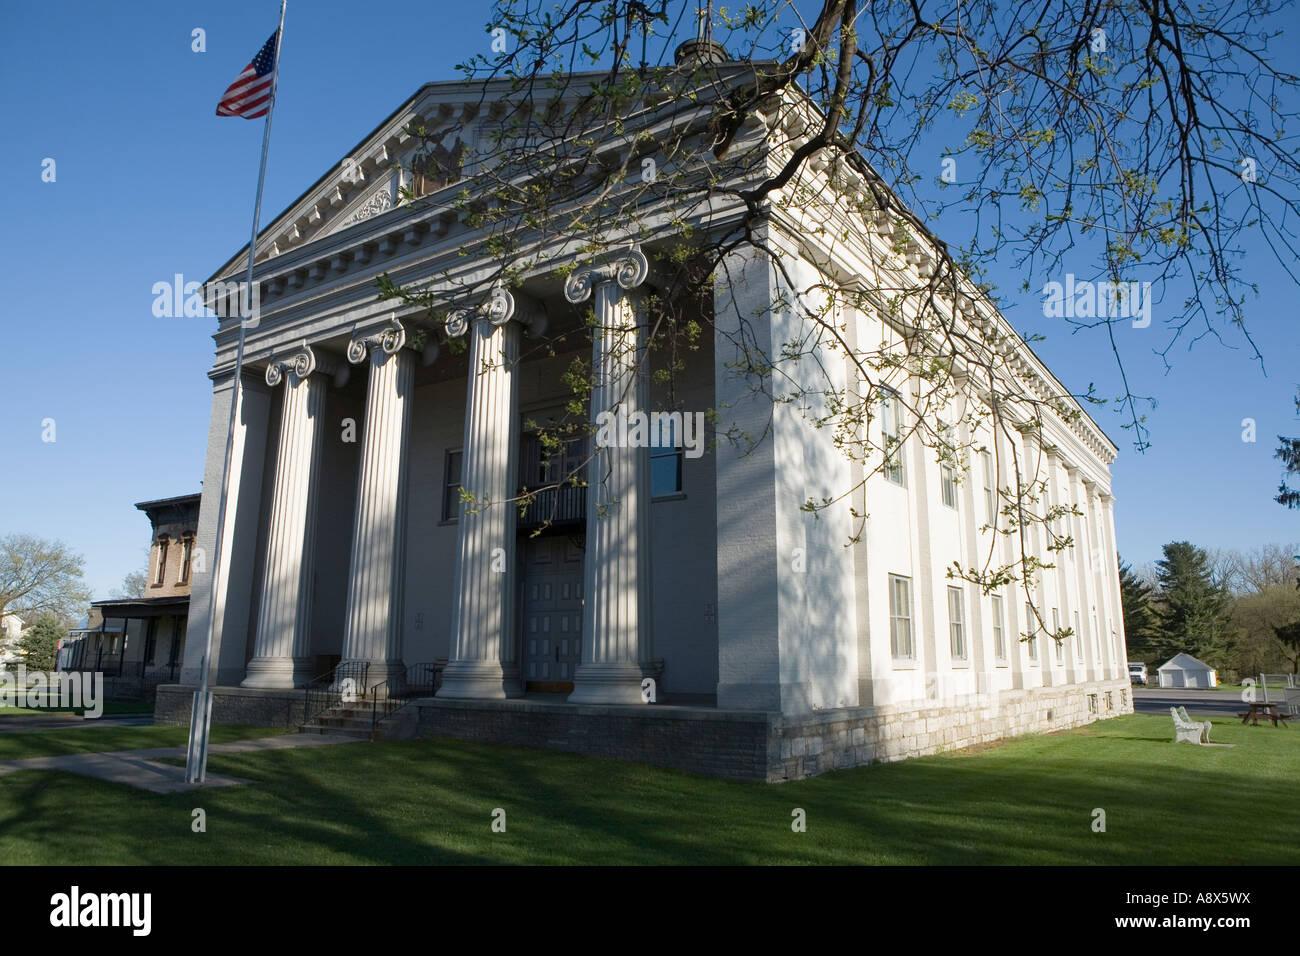 New york montgomery county fonda - Montgomery County Courthouse Fonda New York Mohawk Valley